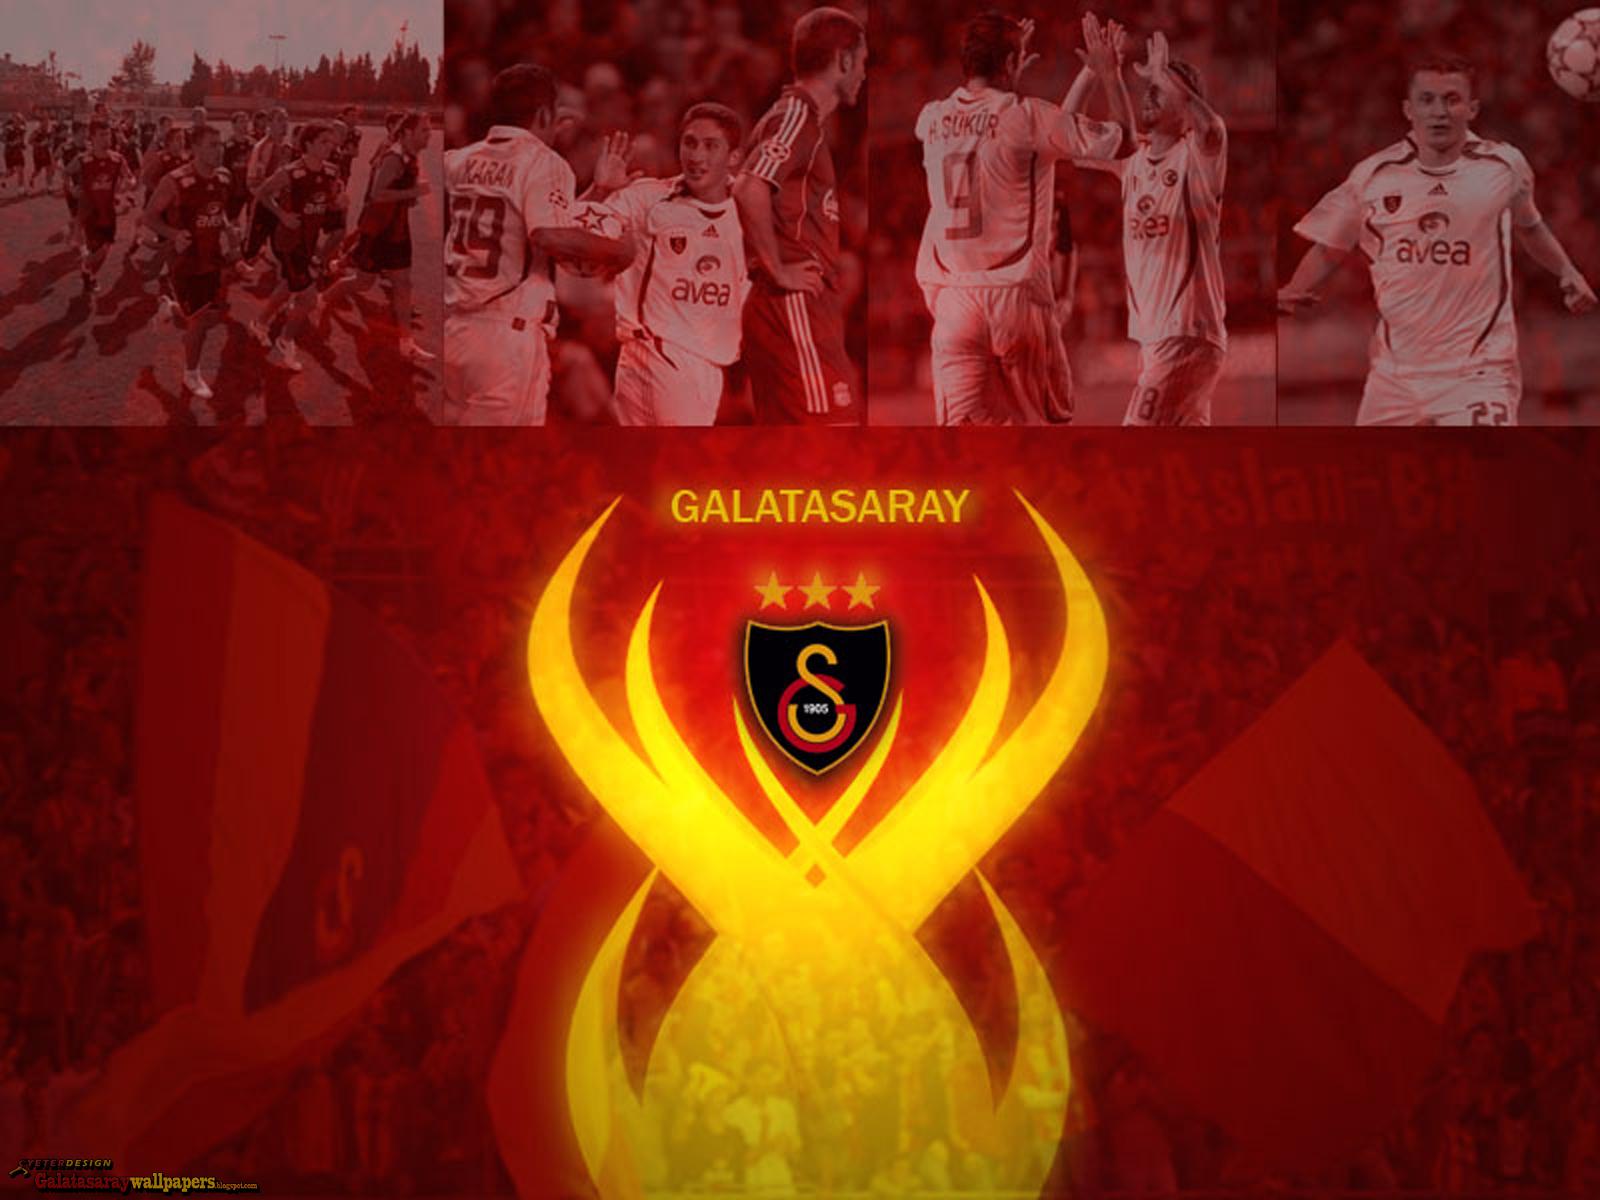 http://1.bp.blogspot.com/_1_qHrQBPgHE/TMTvyUQ40bI/AAAAAAAABIM/ftWjTxfFloo/s1600/Galatasaray+2006-2007+1.jpg